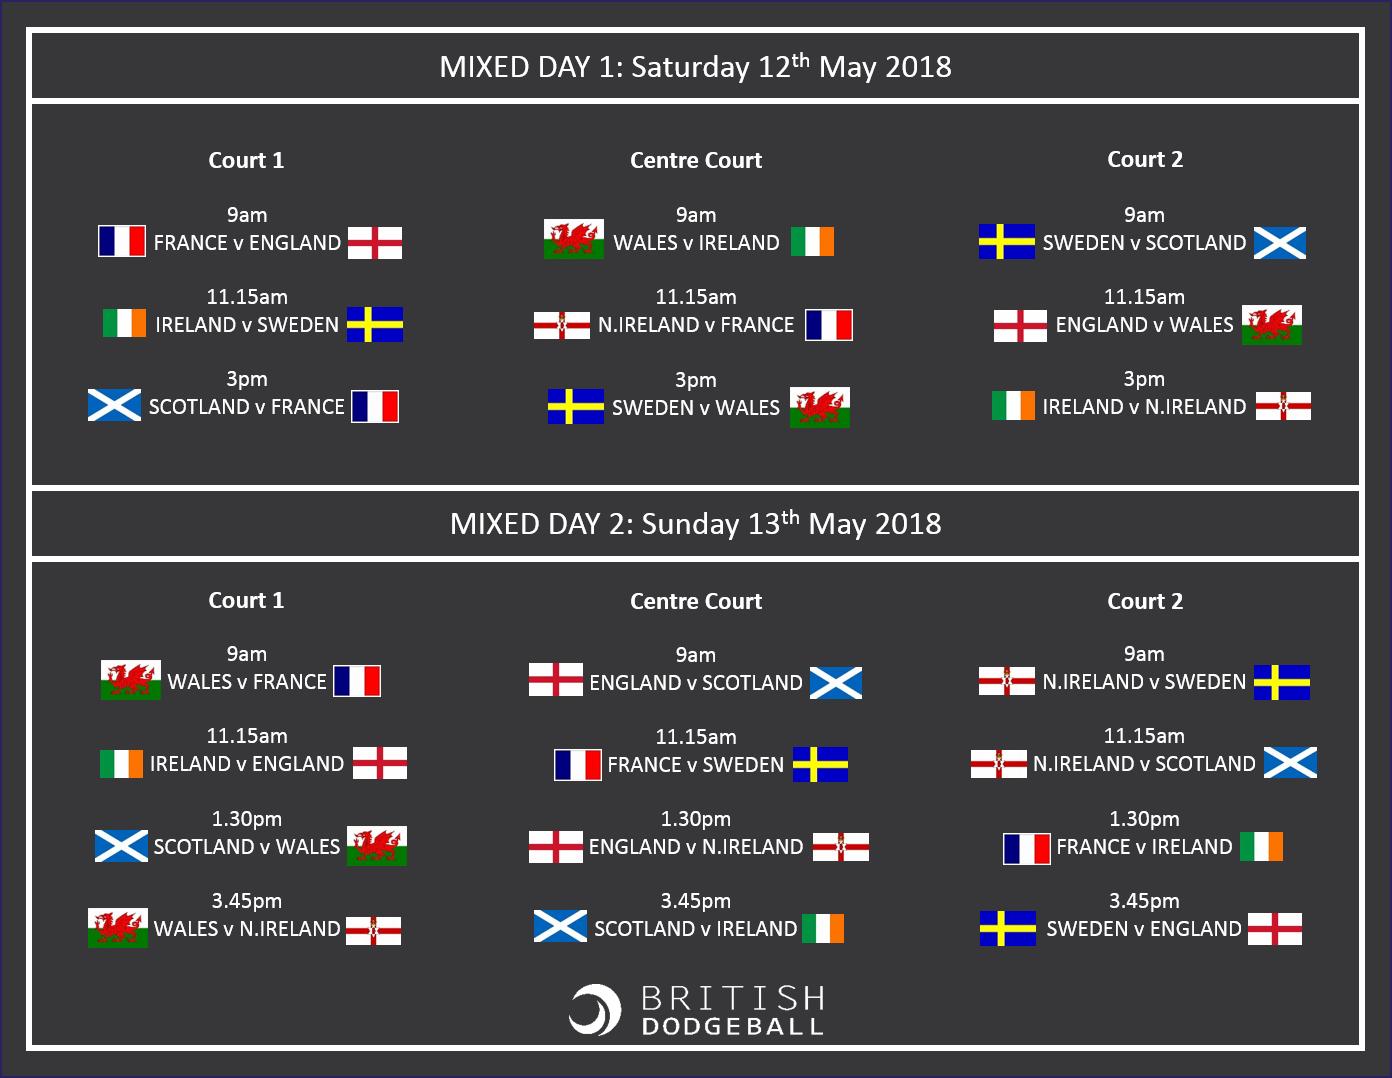 Northern European Dodgeball Championships Mixed Schedule